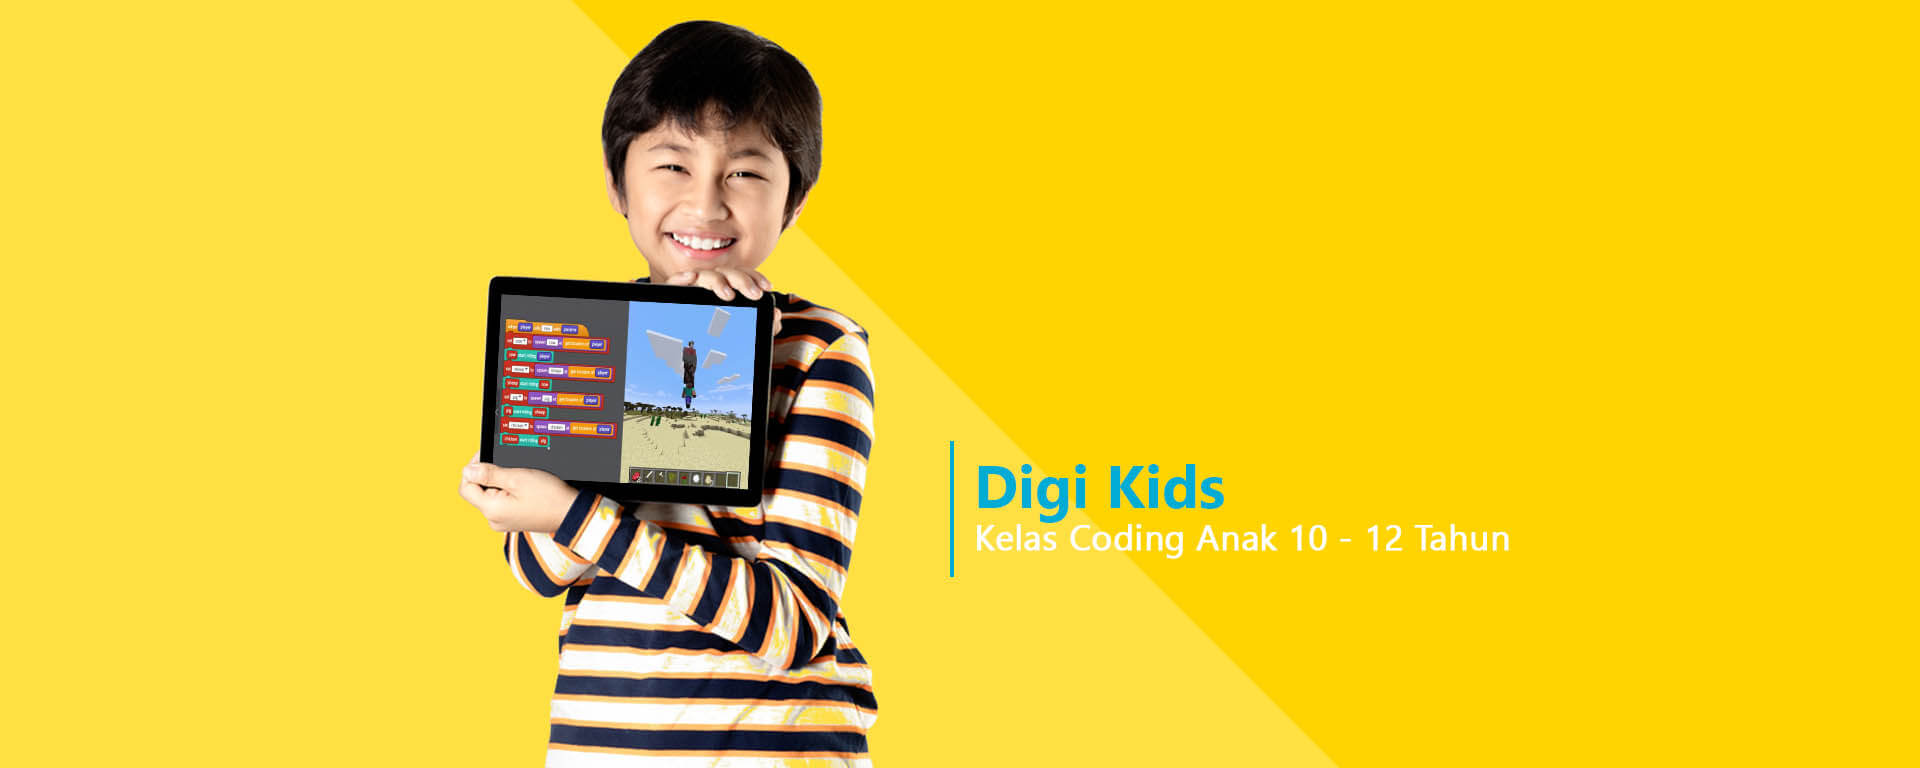 Digi Kids